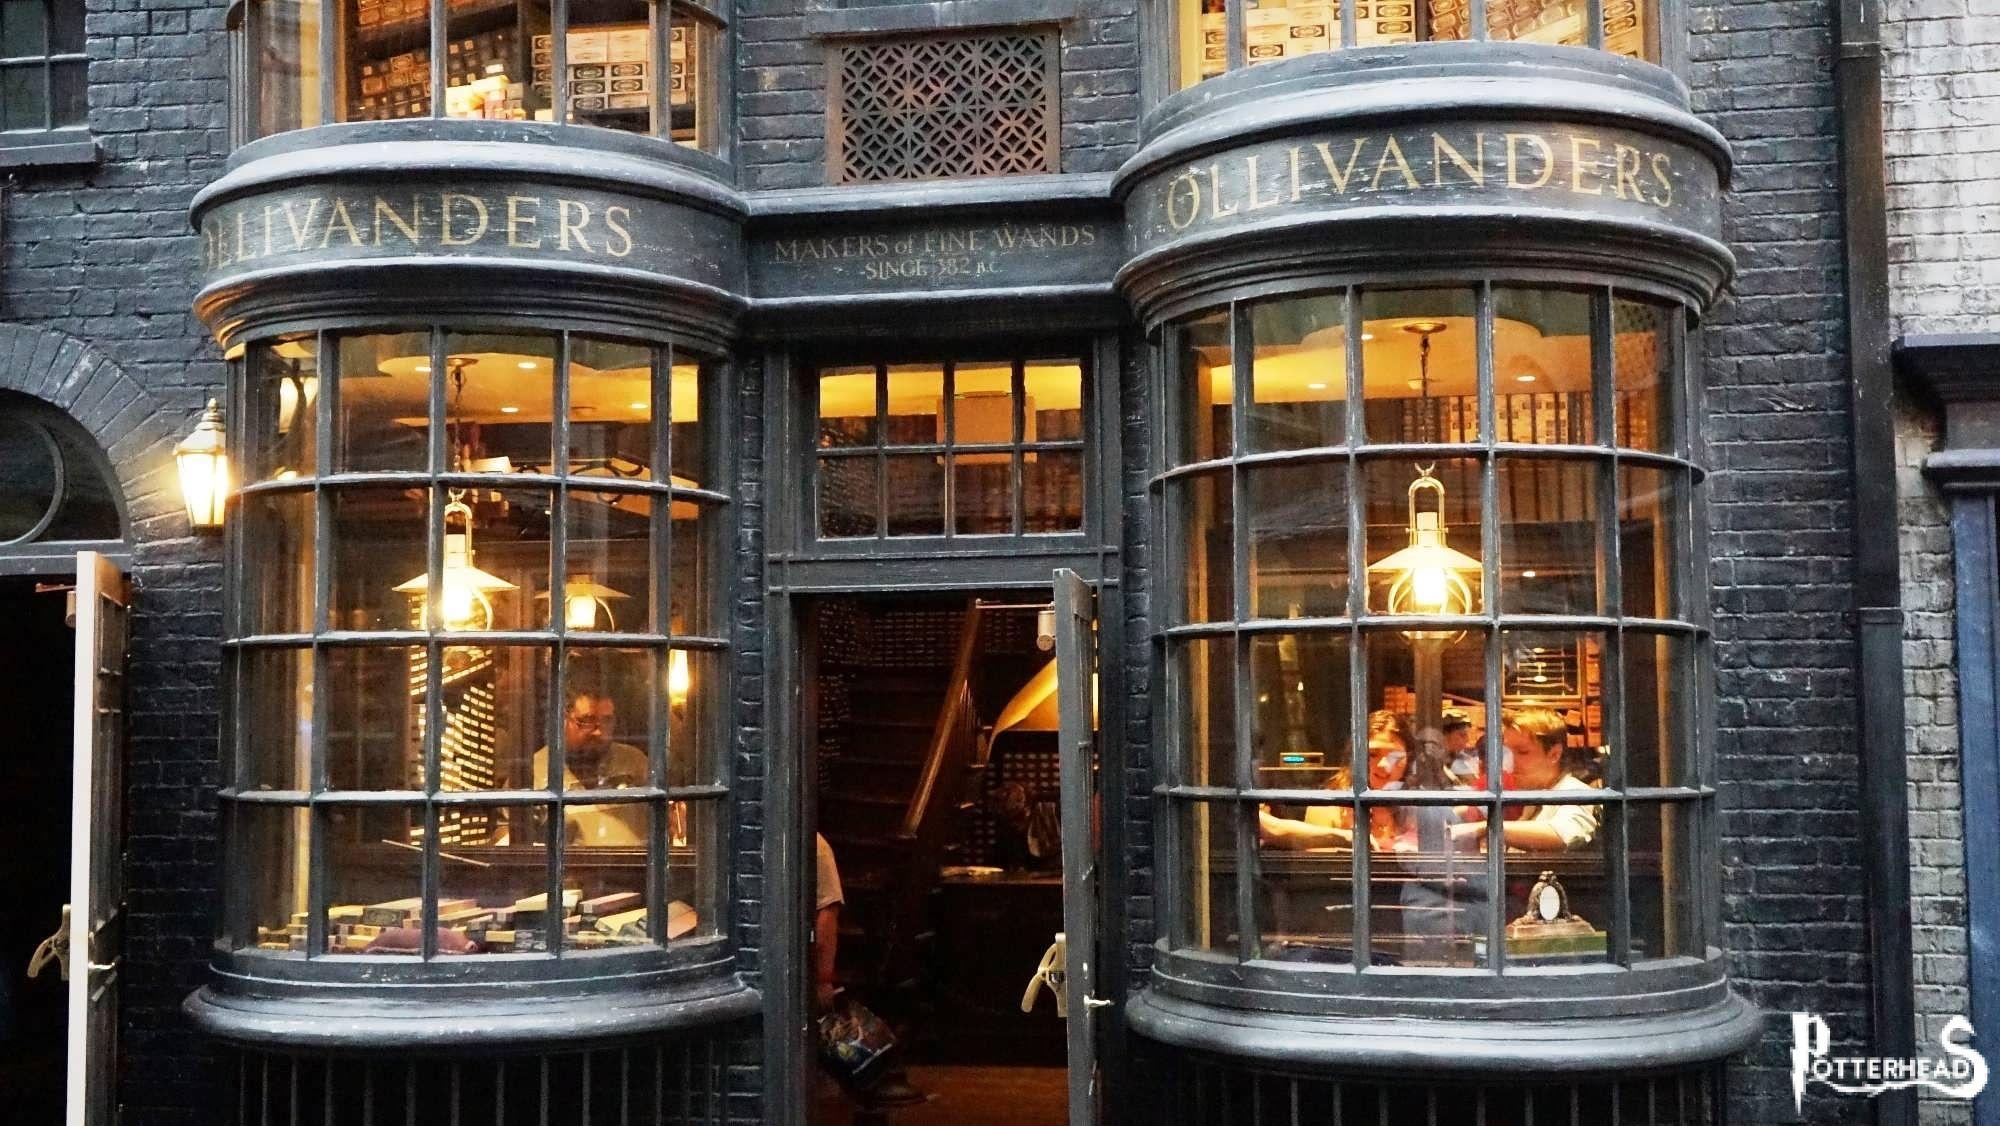 Olivander Harry Potter - PotterPedia.it